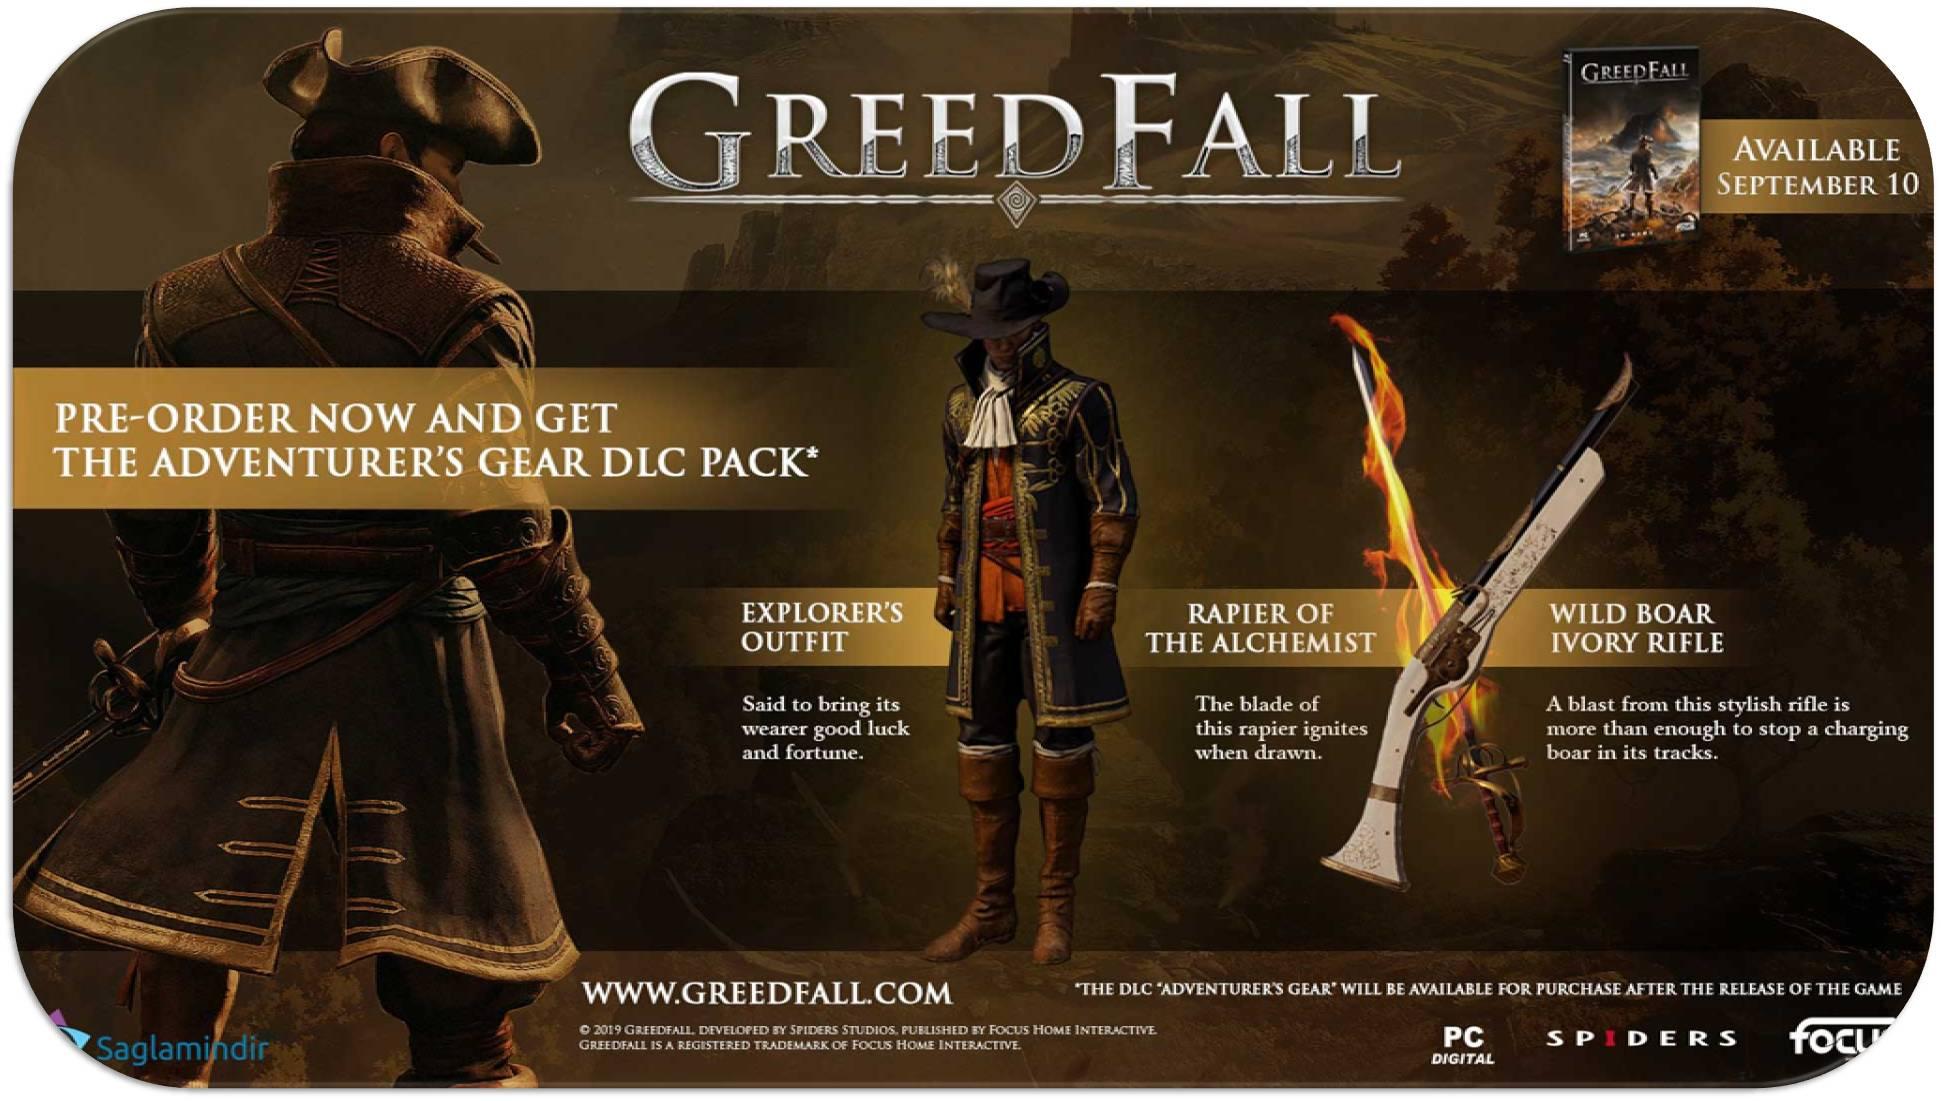 GreedFall saglamindir